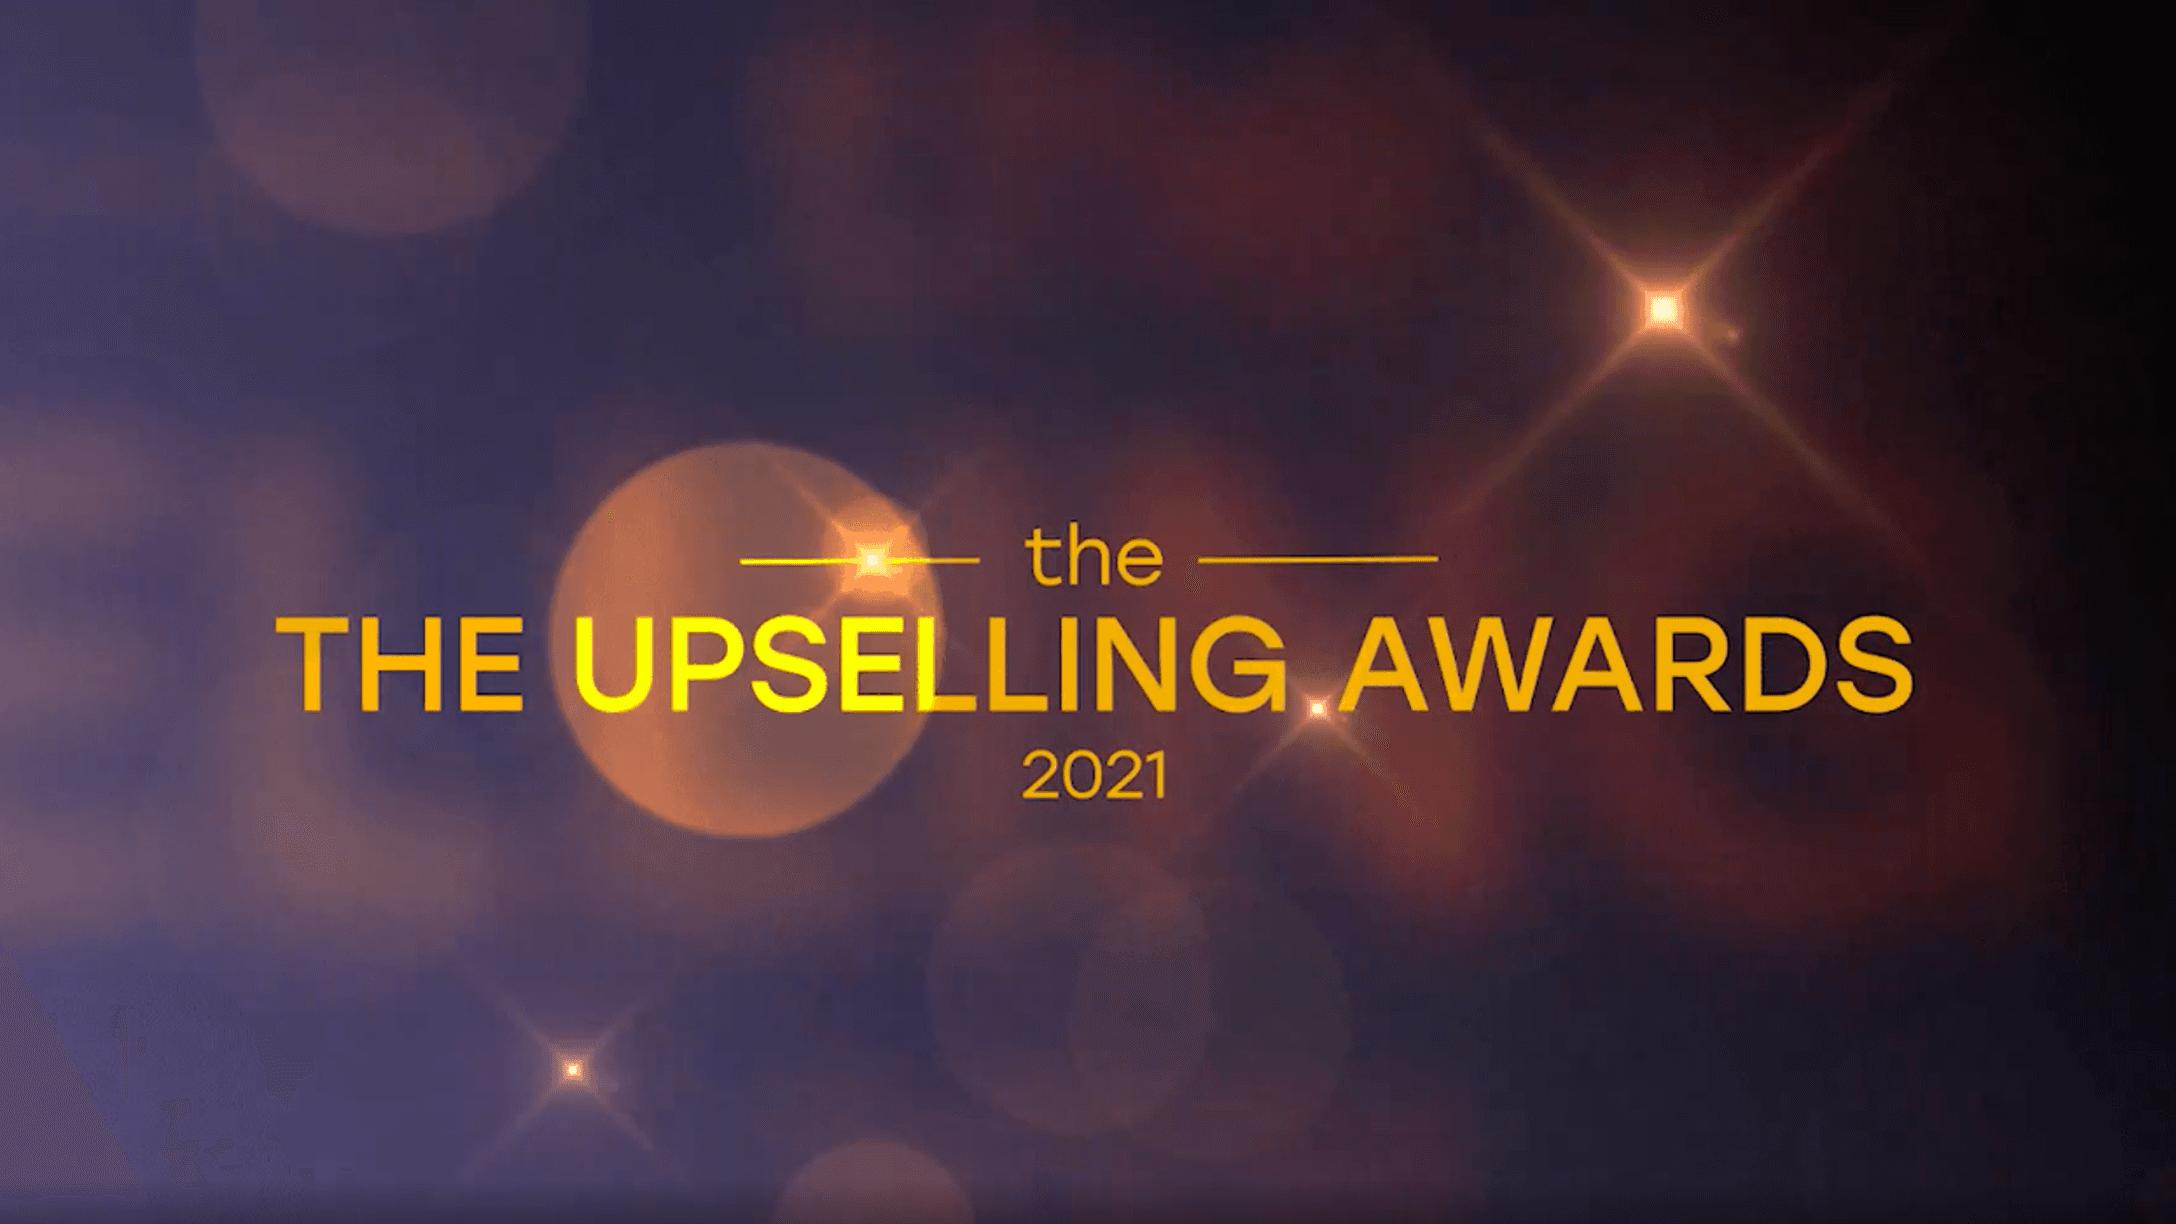 Upsell awards 21